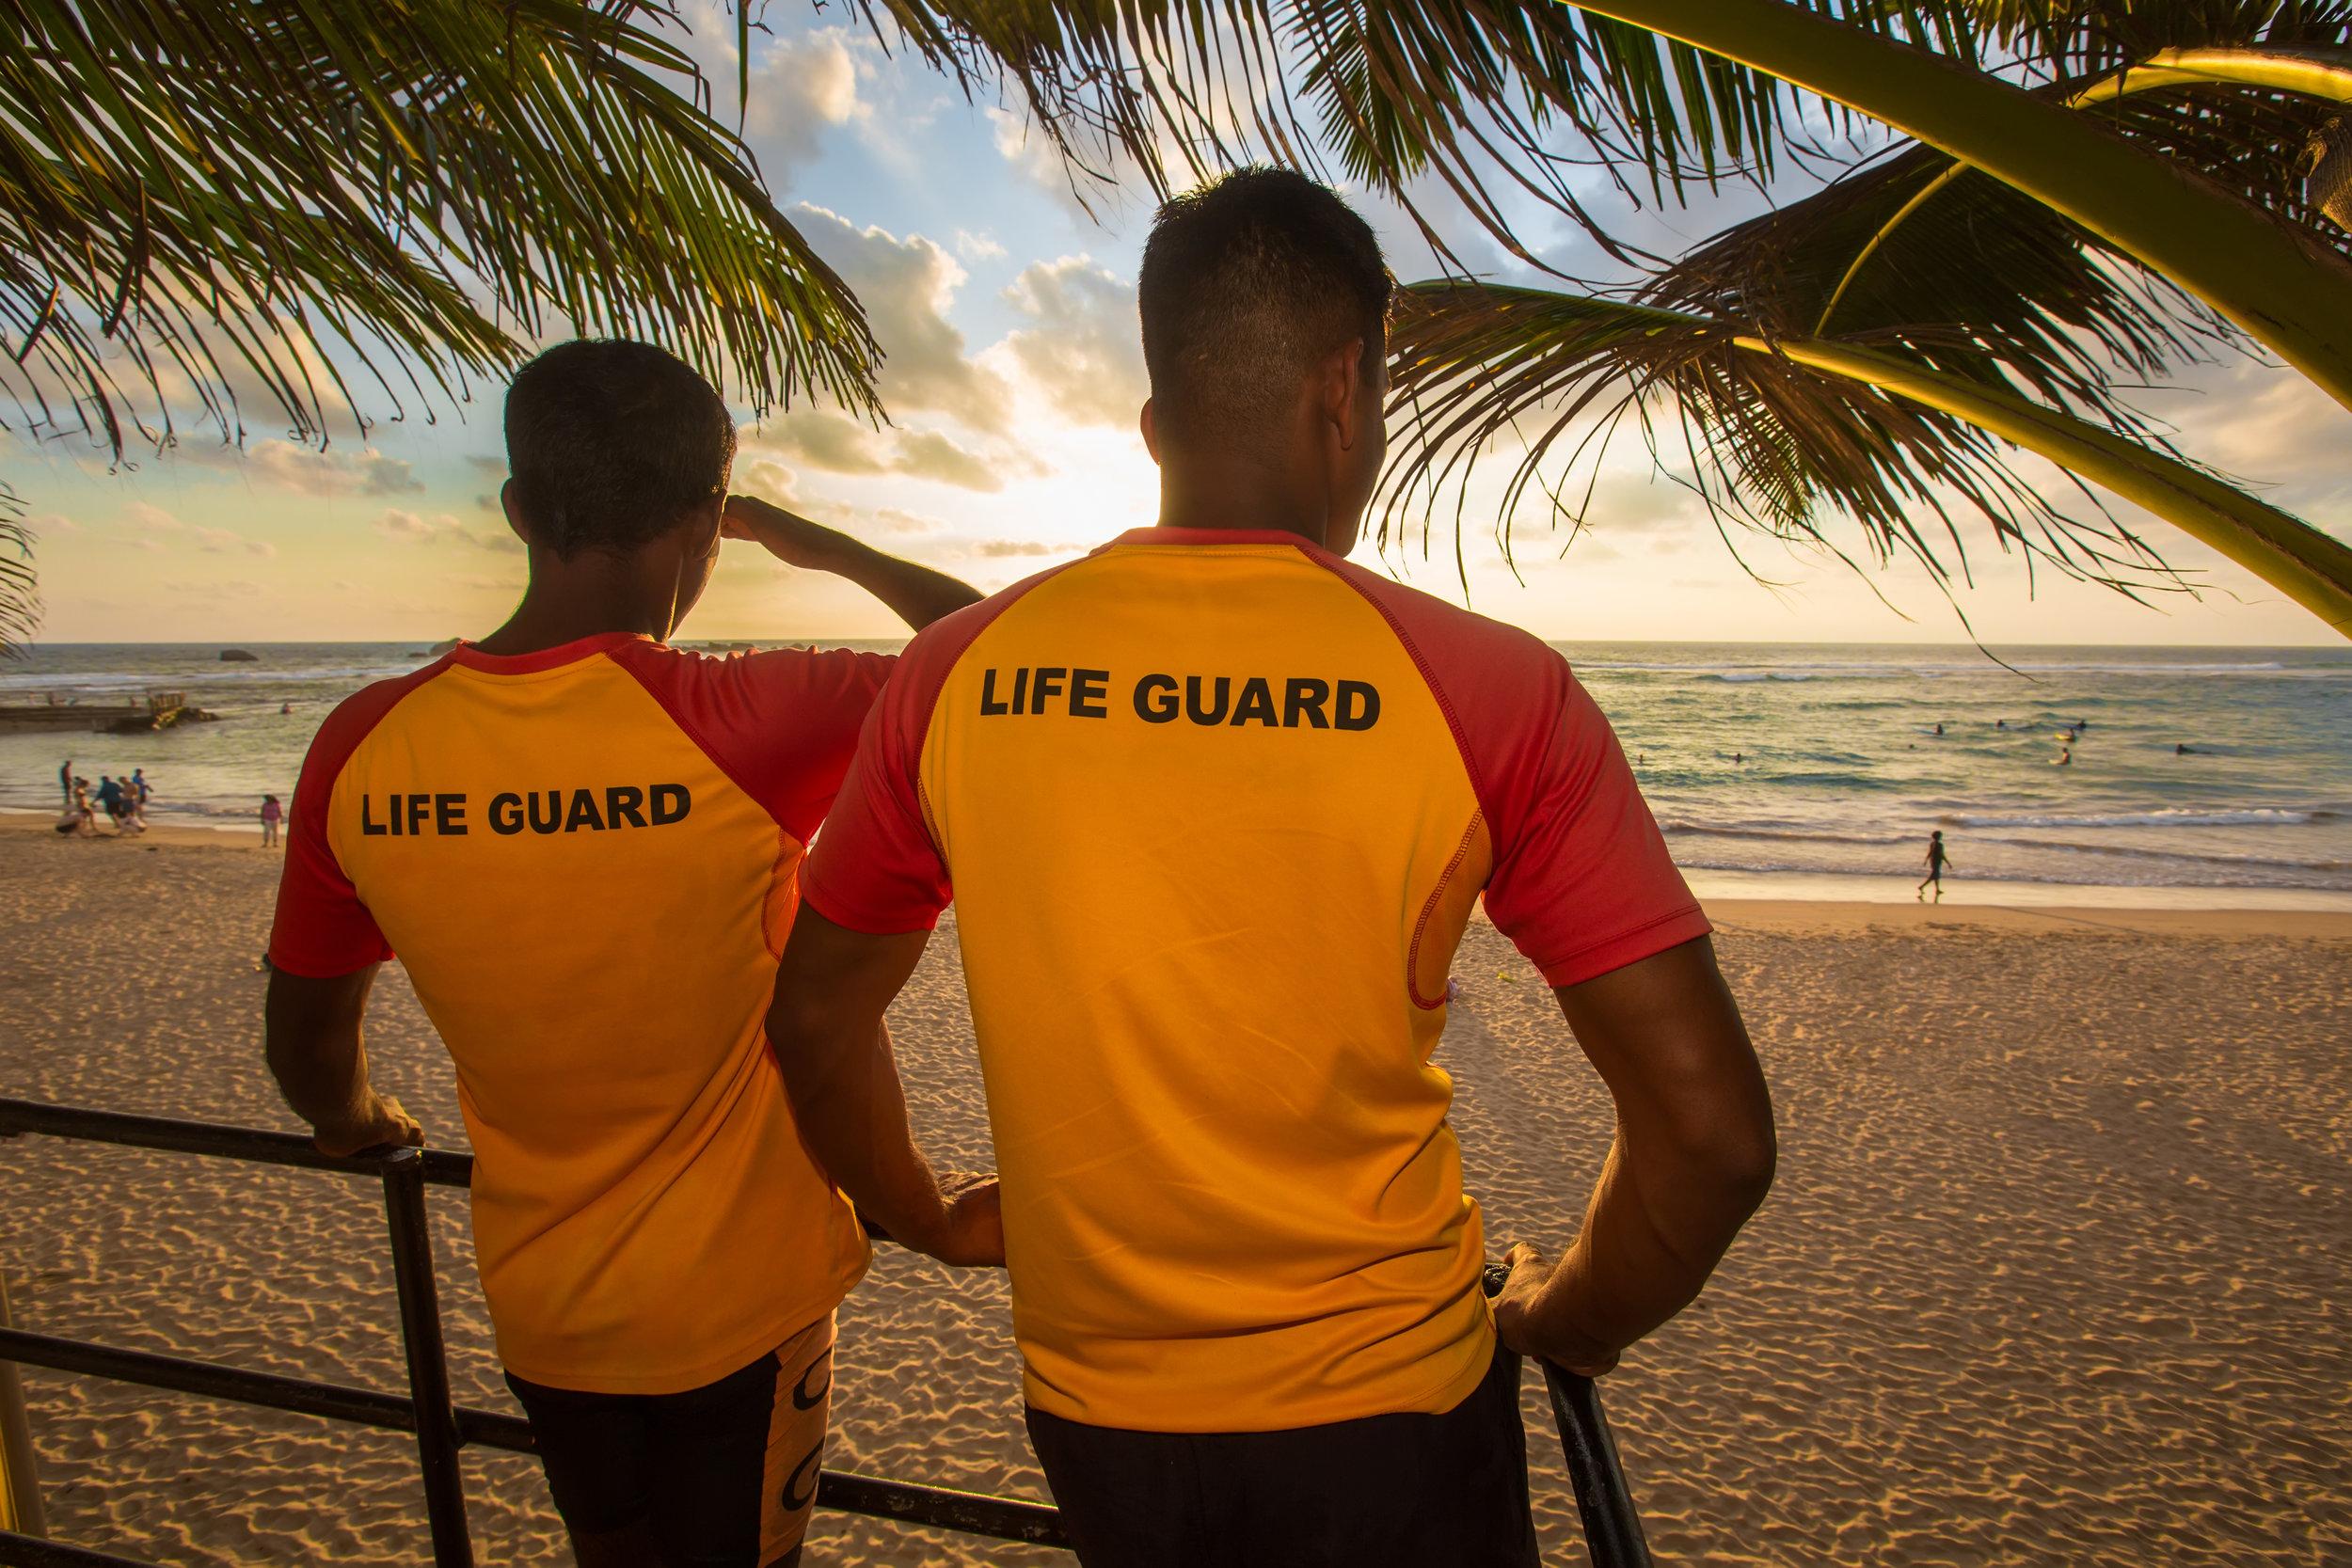 srilanka_bigstock-Lifeguard-On-The-Beach-Sri-Lan-213787957.jpg